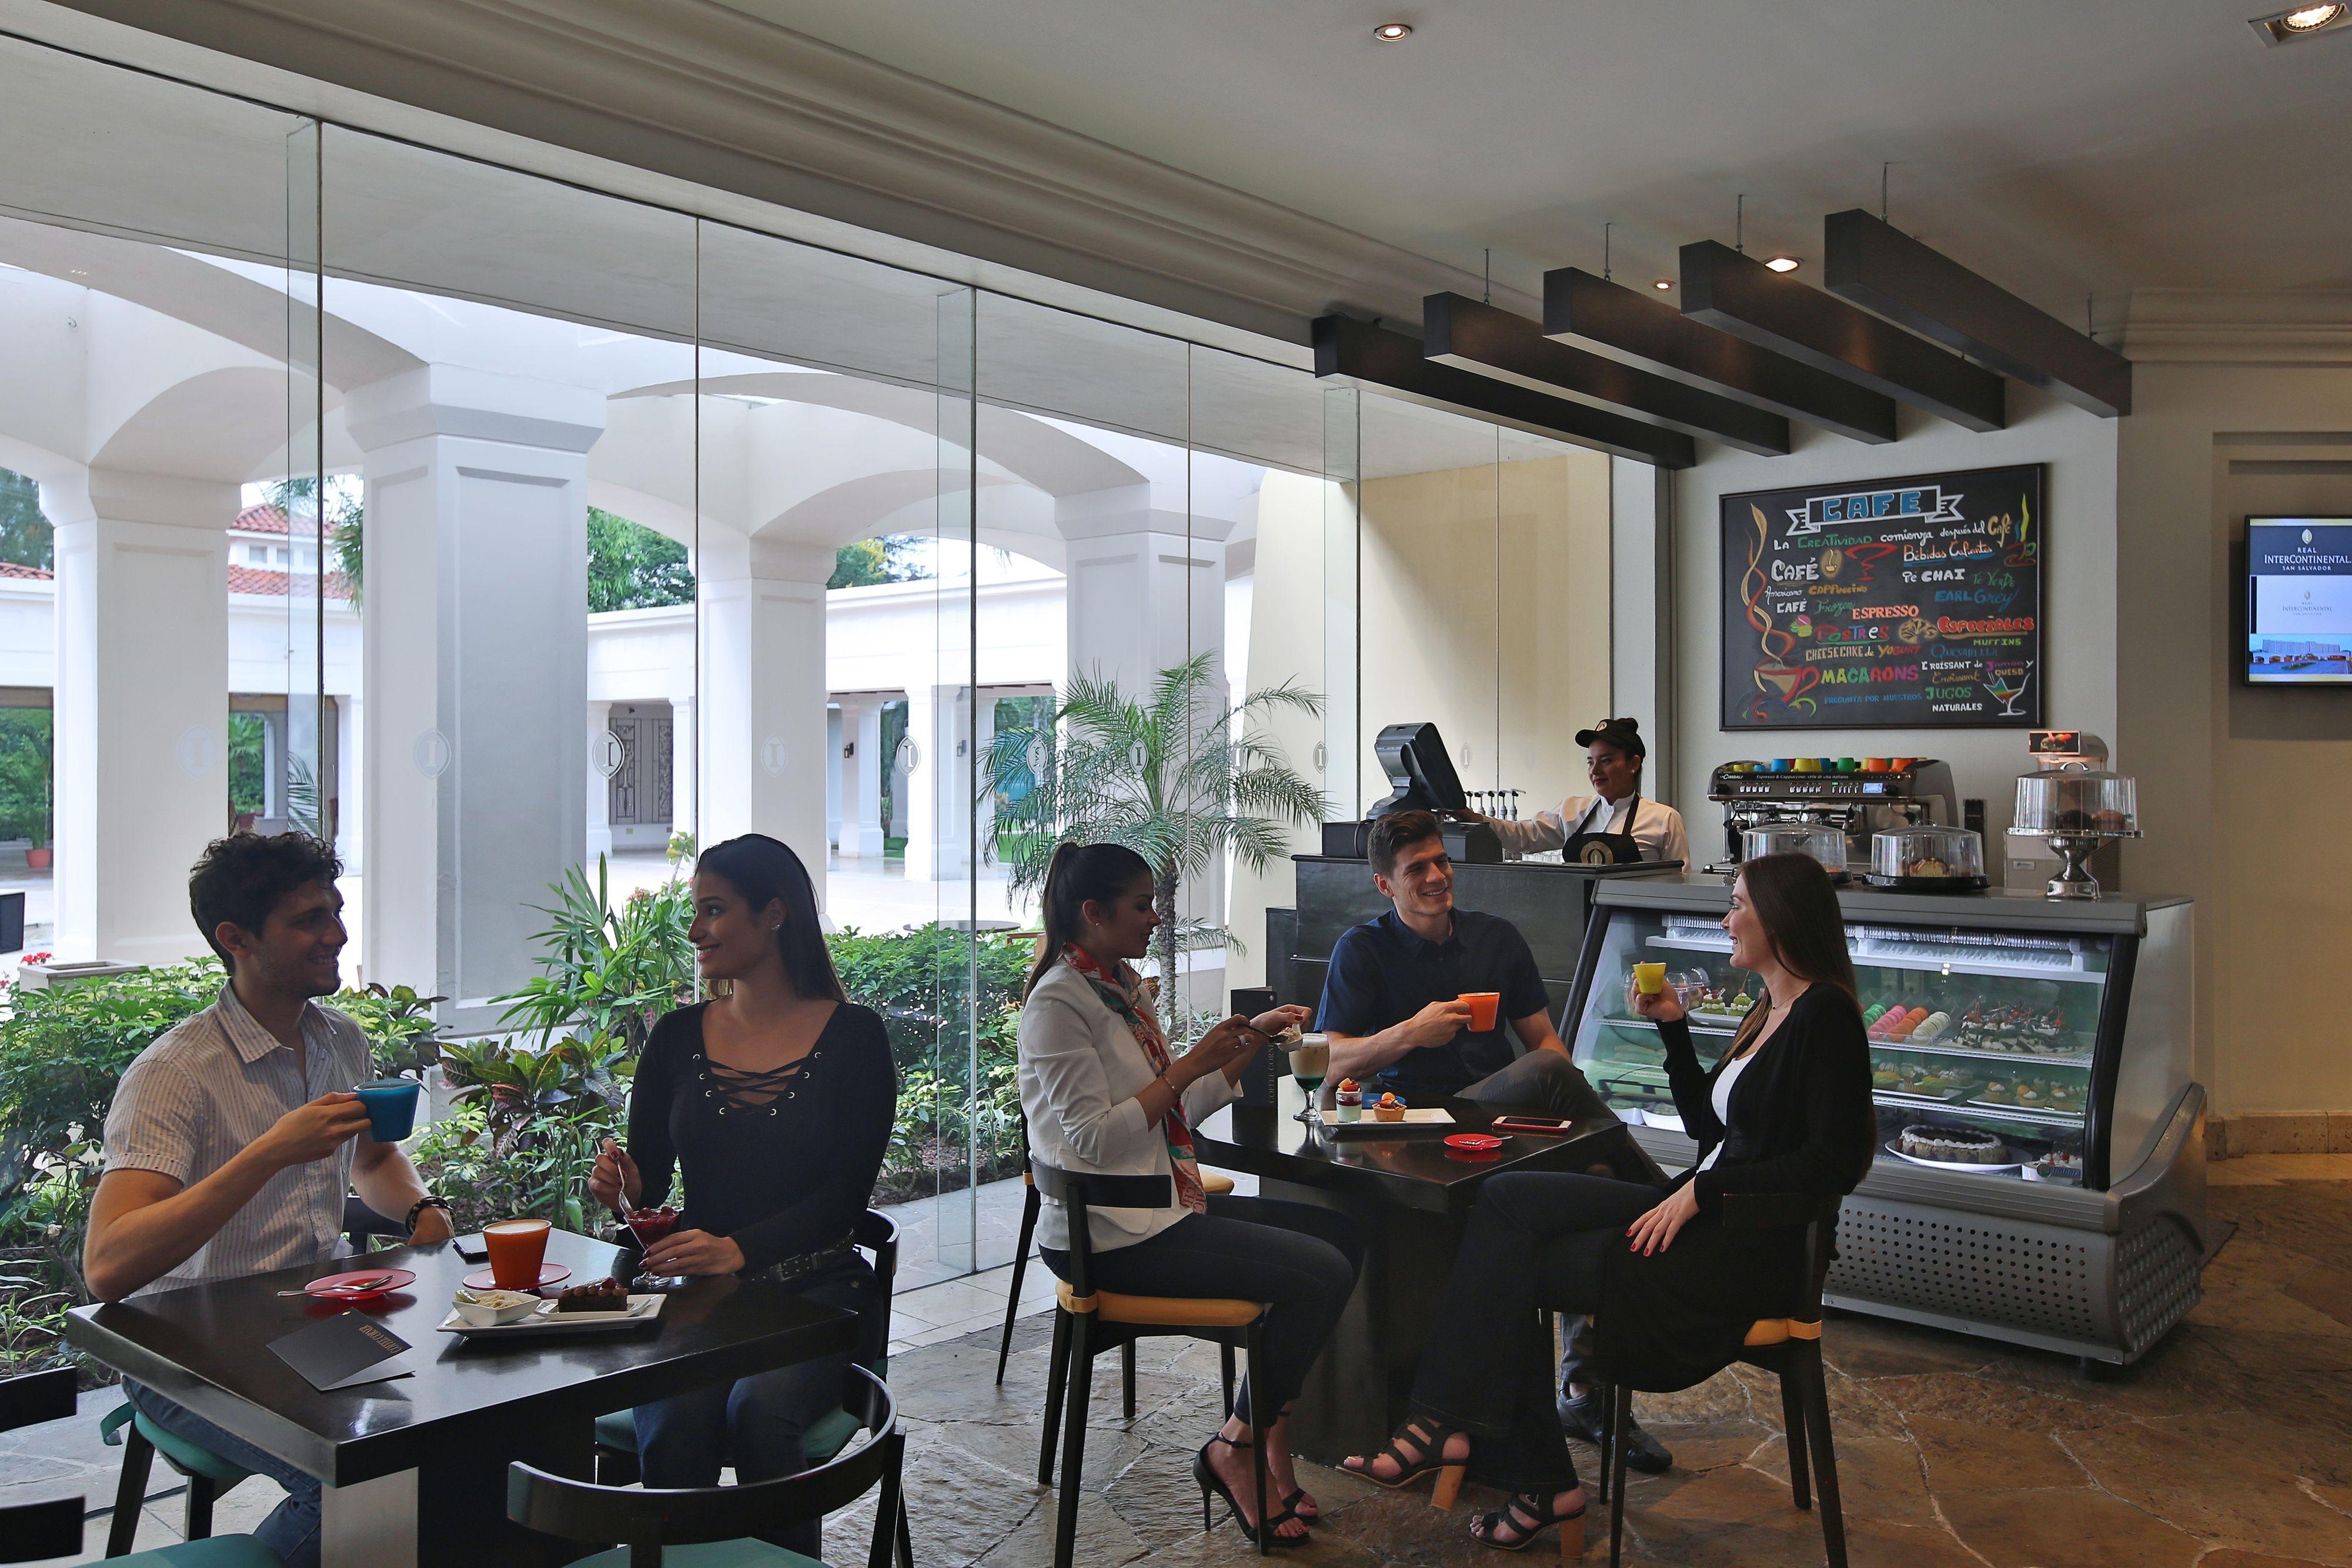 InterContinental San Salvador-Metrocentro Mall